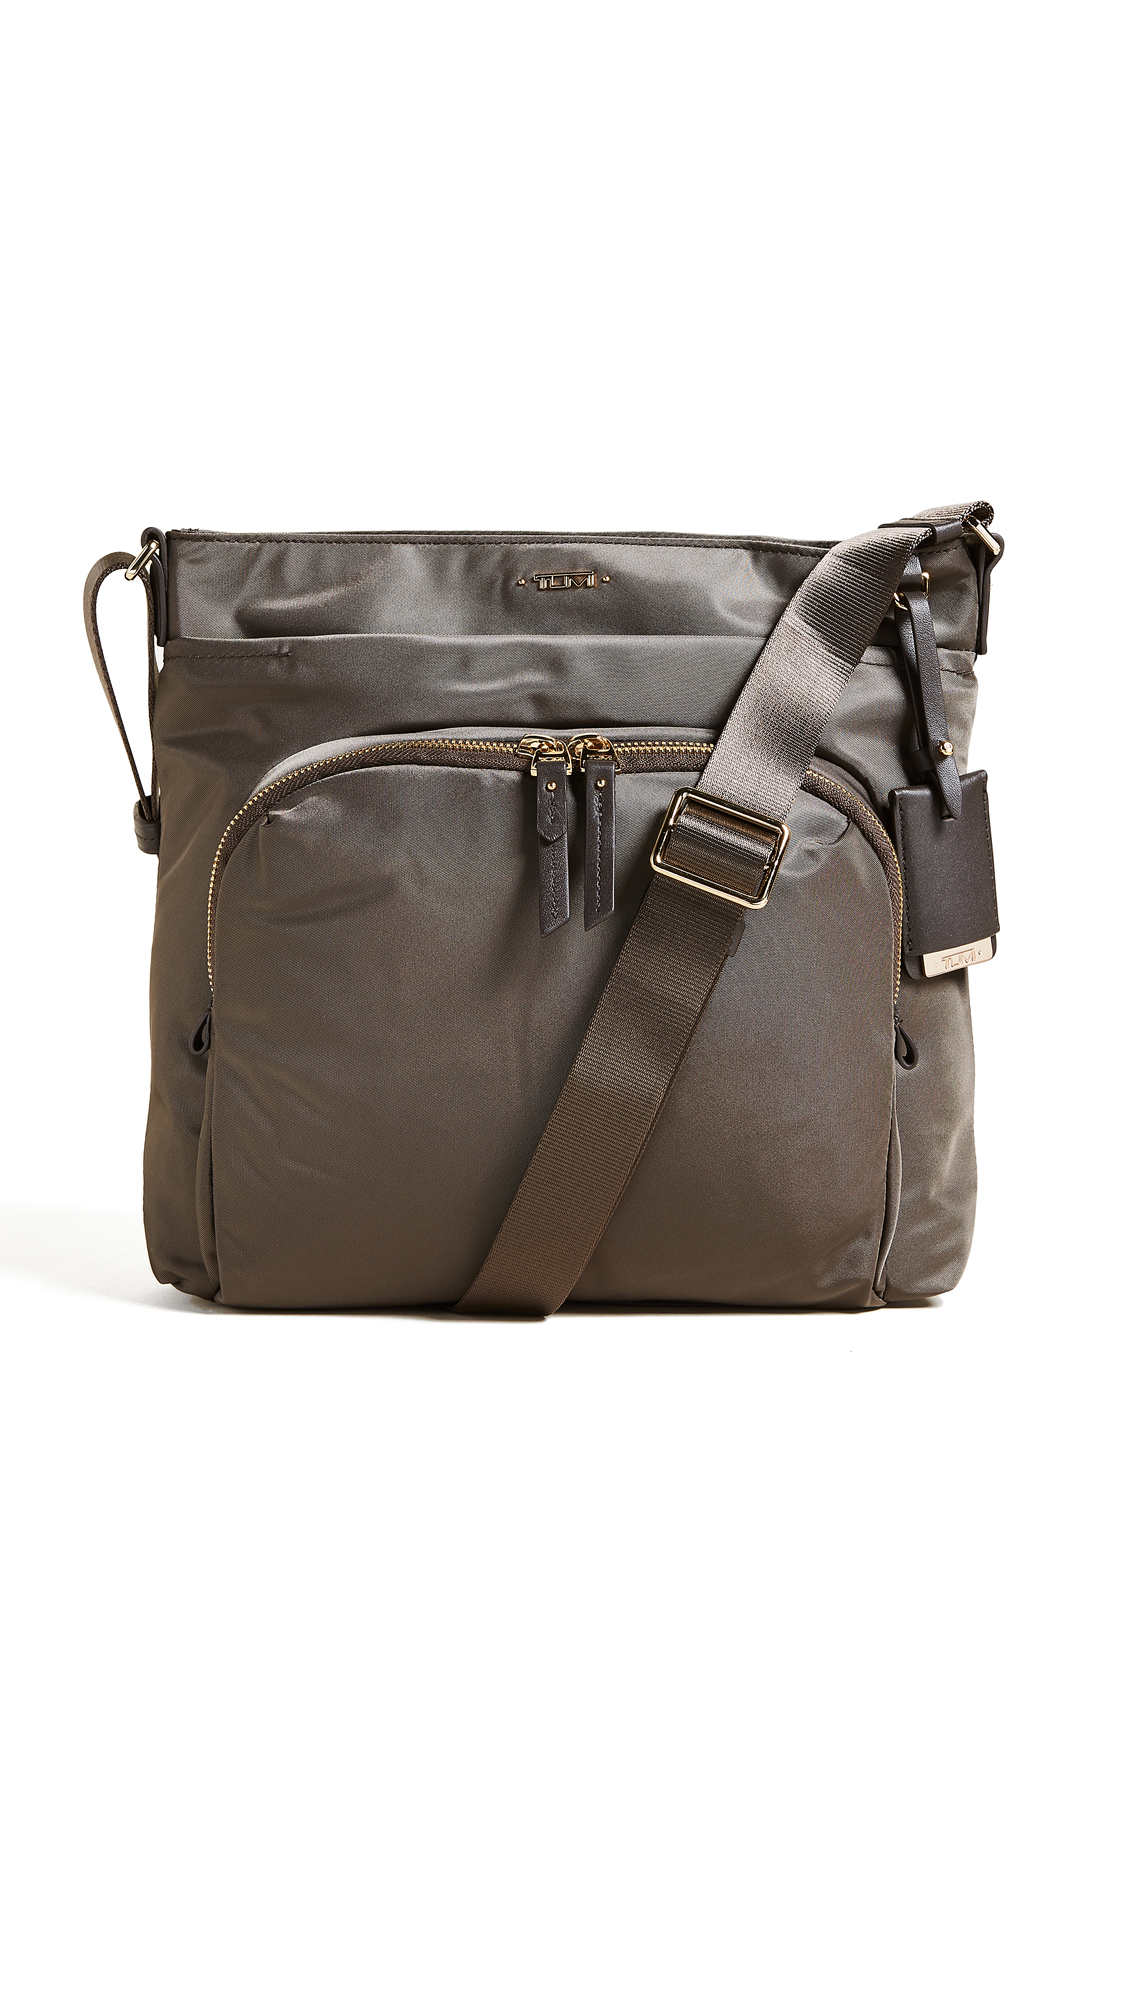 Tumi Capri Cross Body Bag - Mink